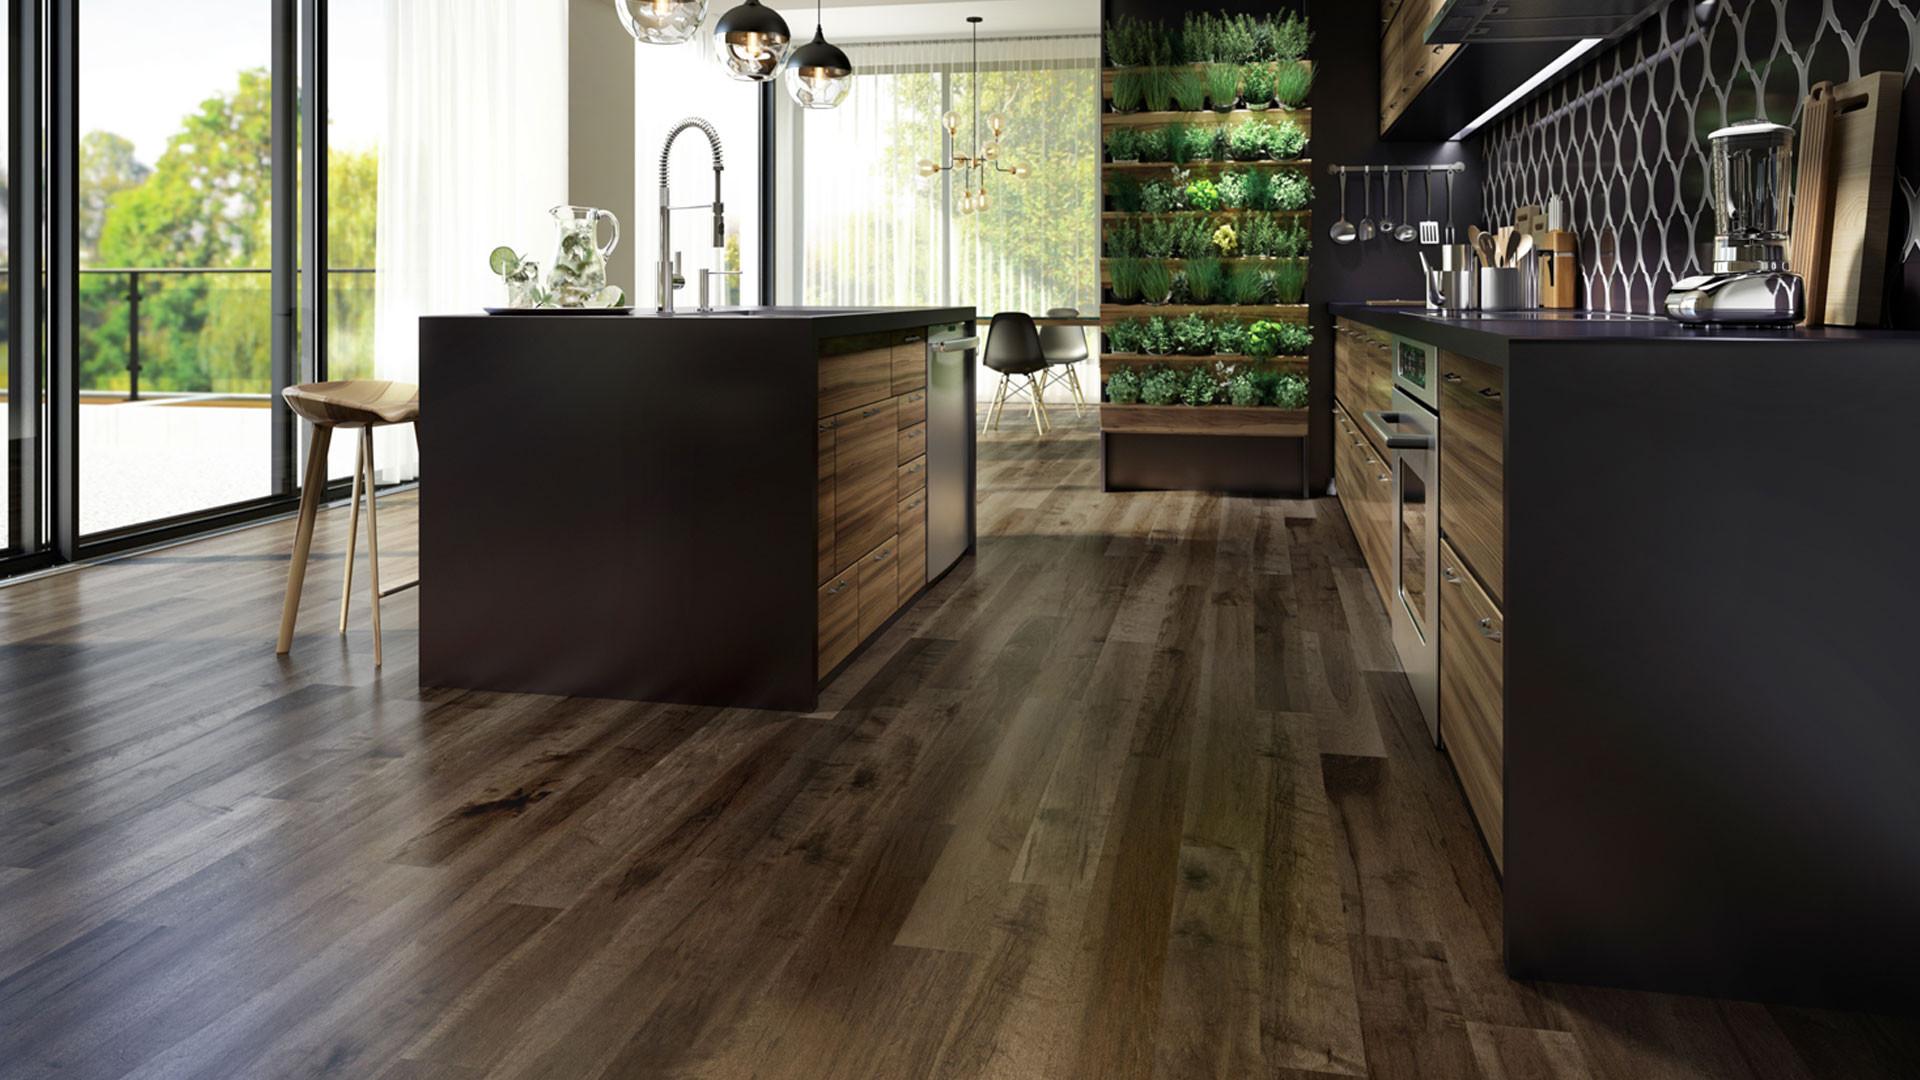 hardwood flooring installation toronto of 4 latest hardwood flooring trends lauzon flooring intended for top 4 hardwood flooring trends